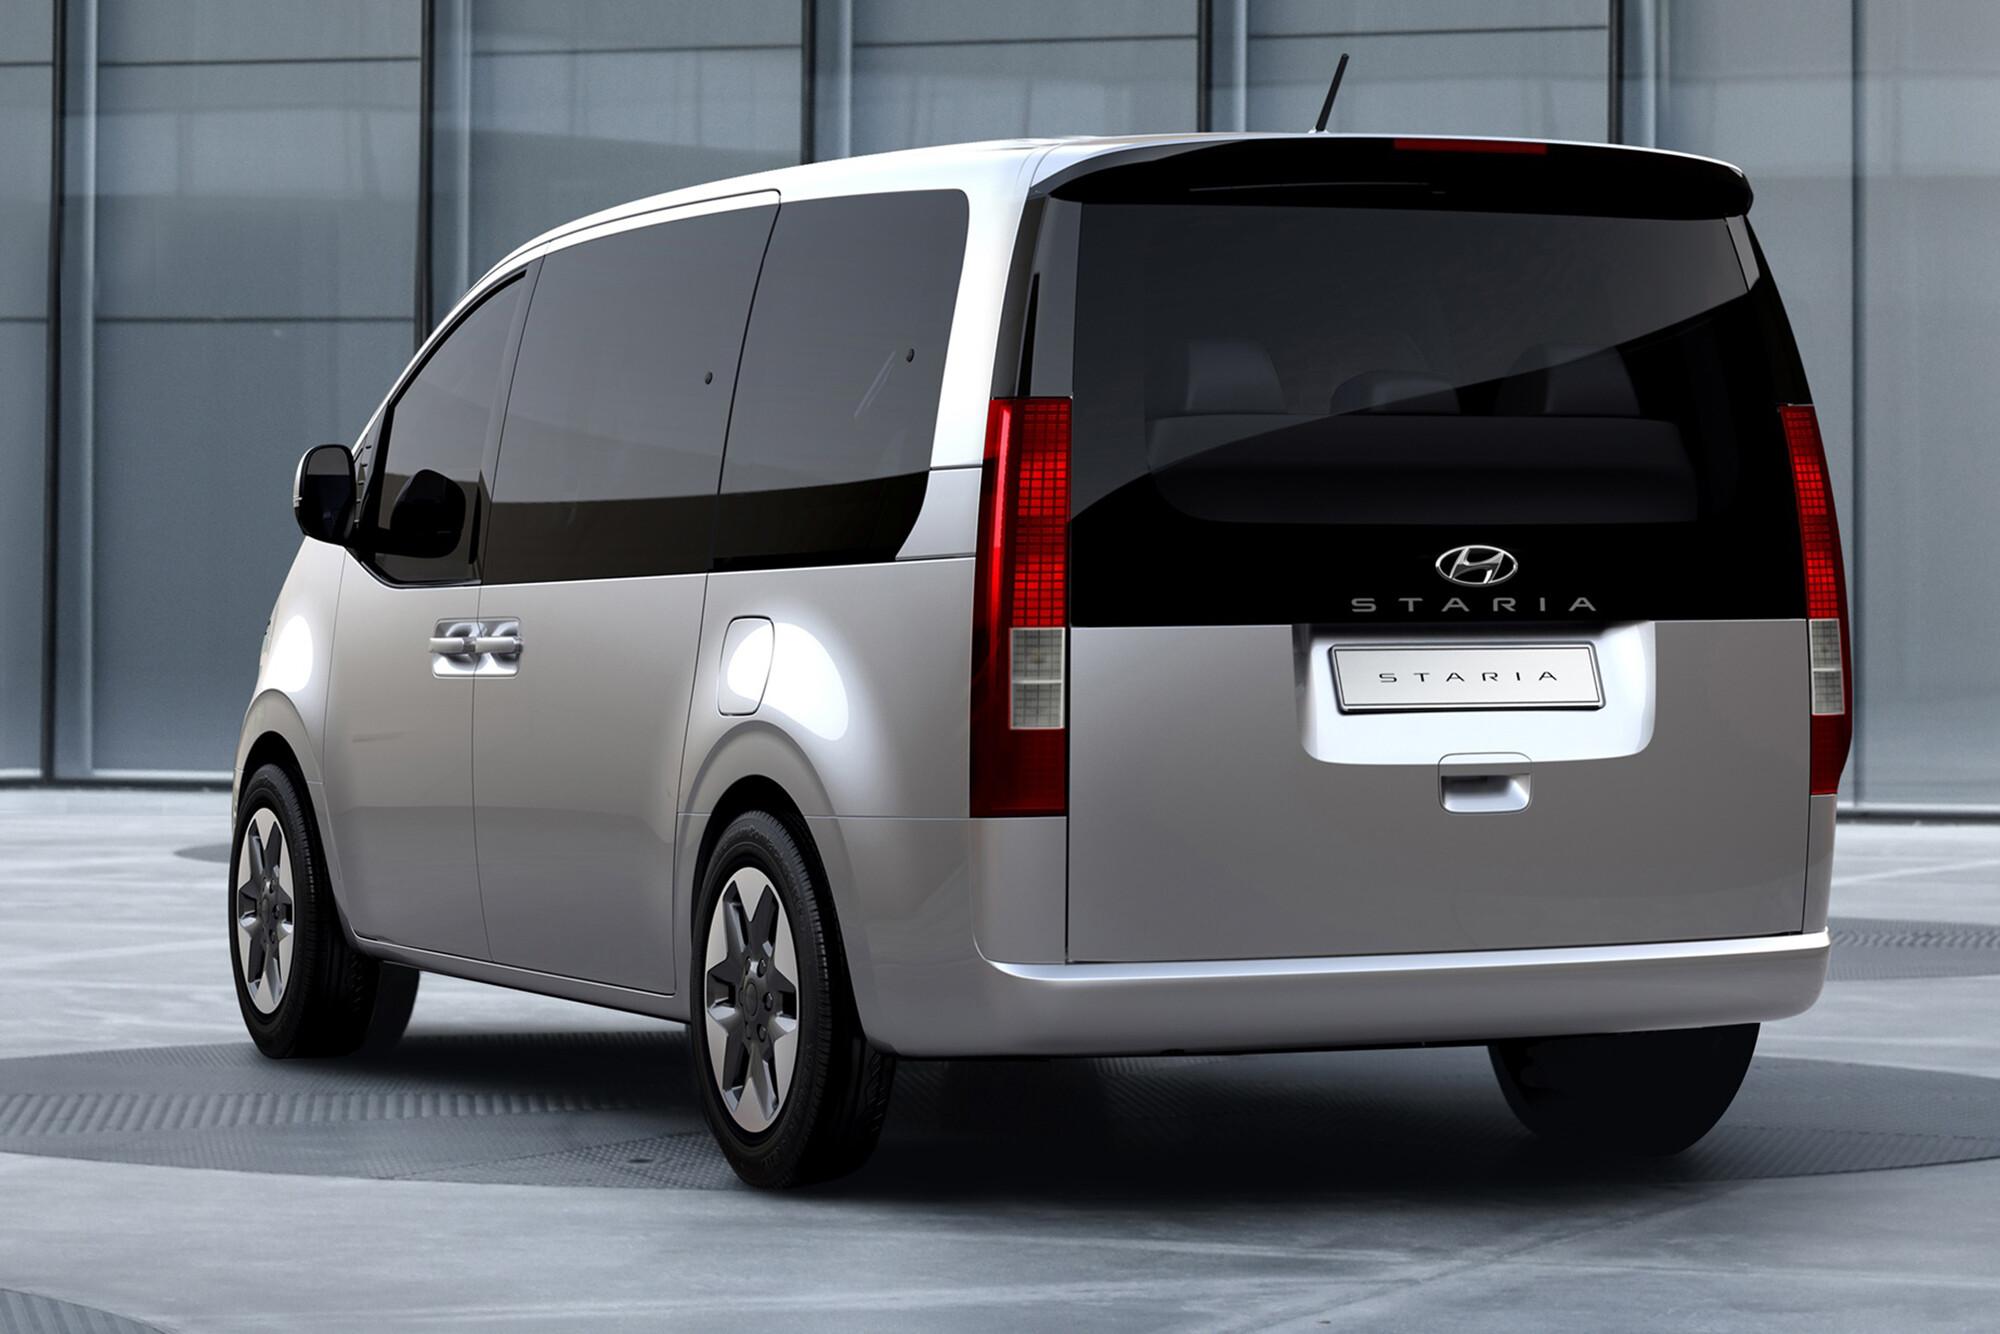 Archive Whichcar 2021 03 18 139824 2022 Hyundai Staria Design Revealed 2